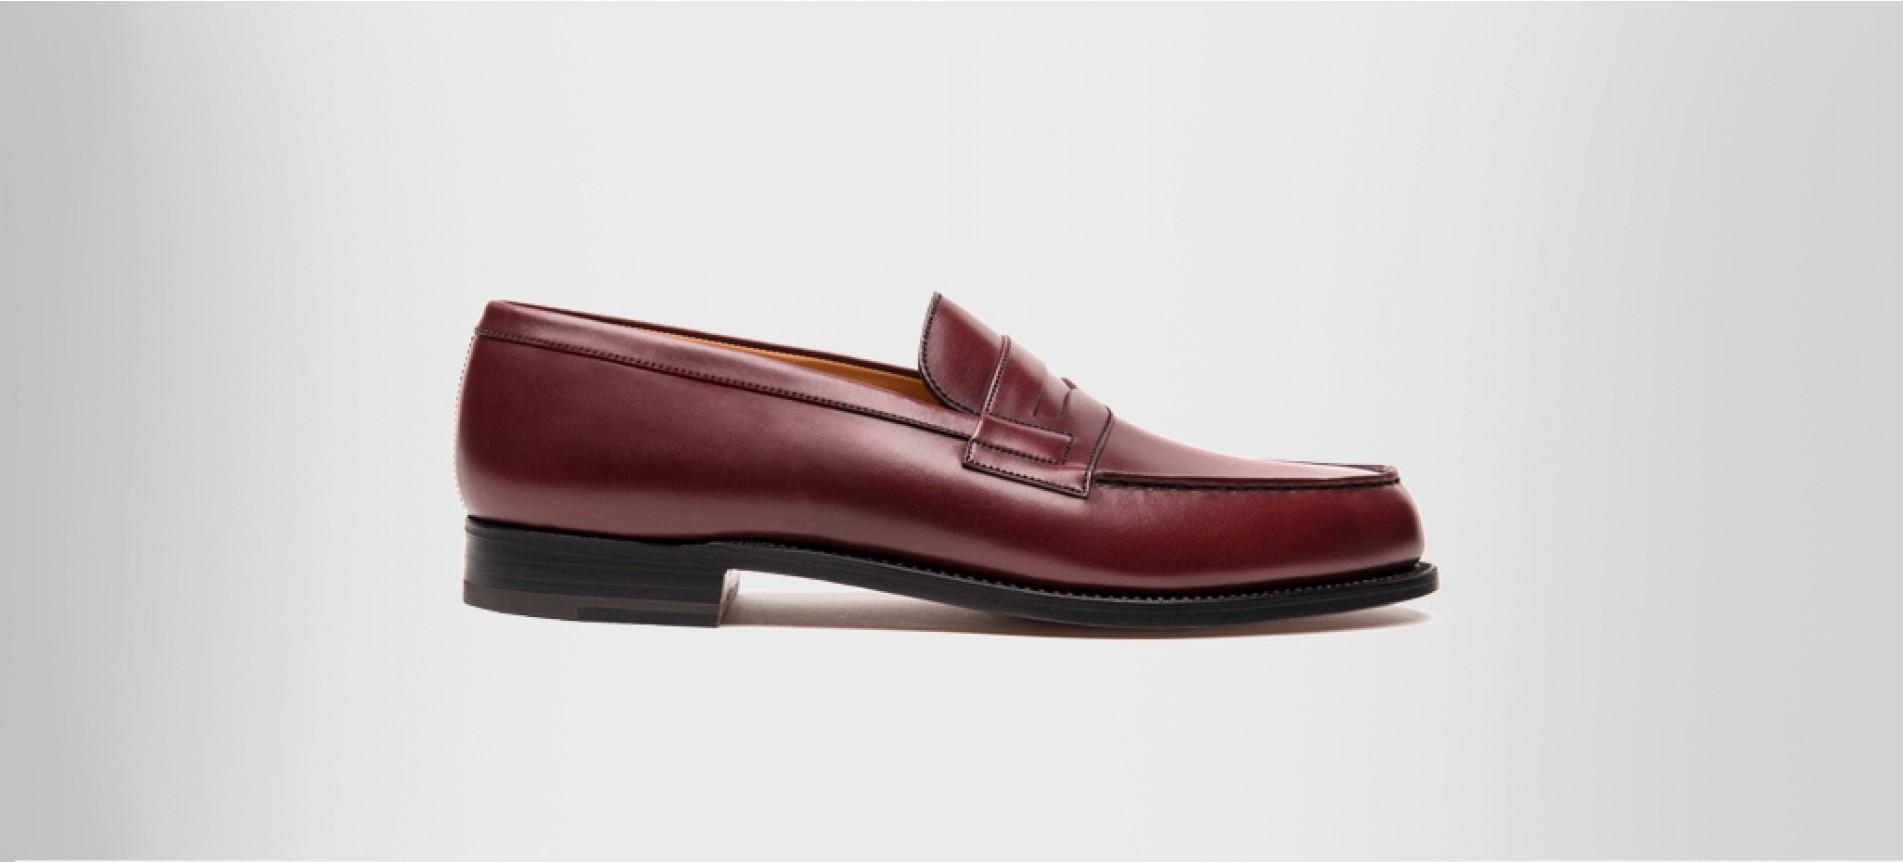 vente chaude authentique grande remise marques reconnues Mocassin 180 Toucan burgundy boxcalf - Loafers J.M. Weston